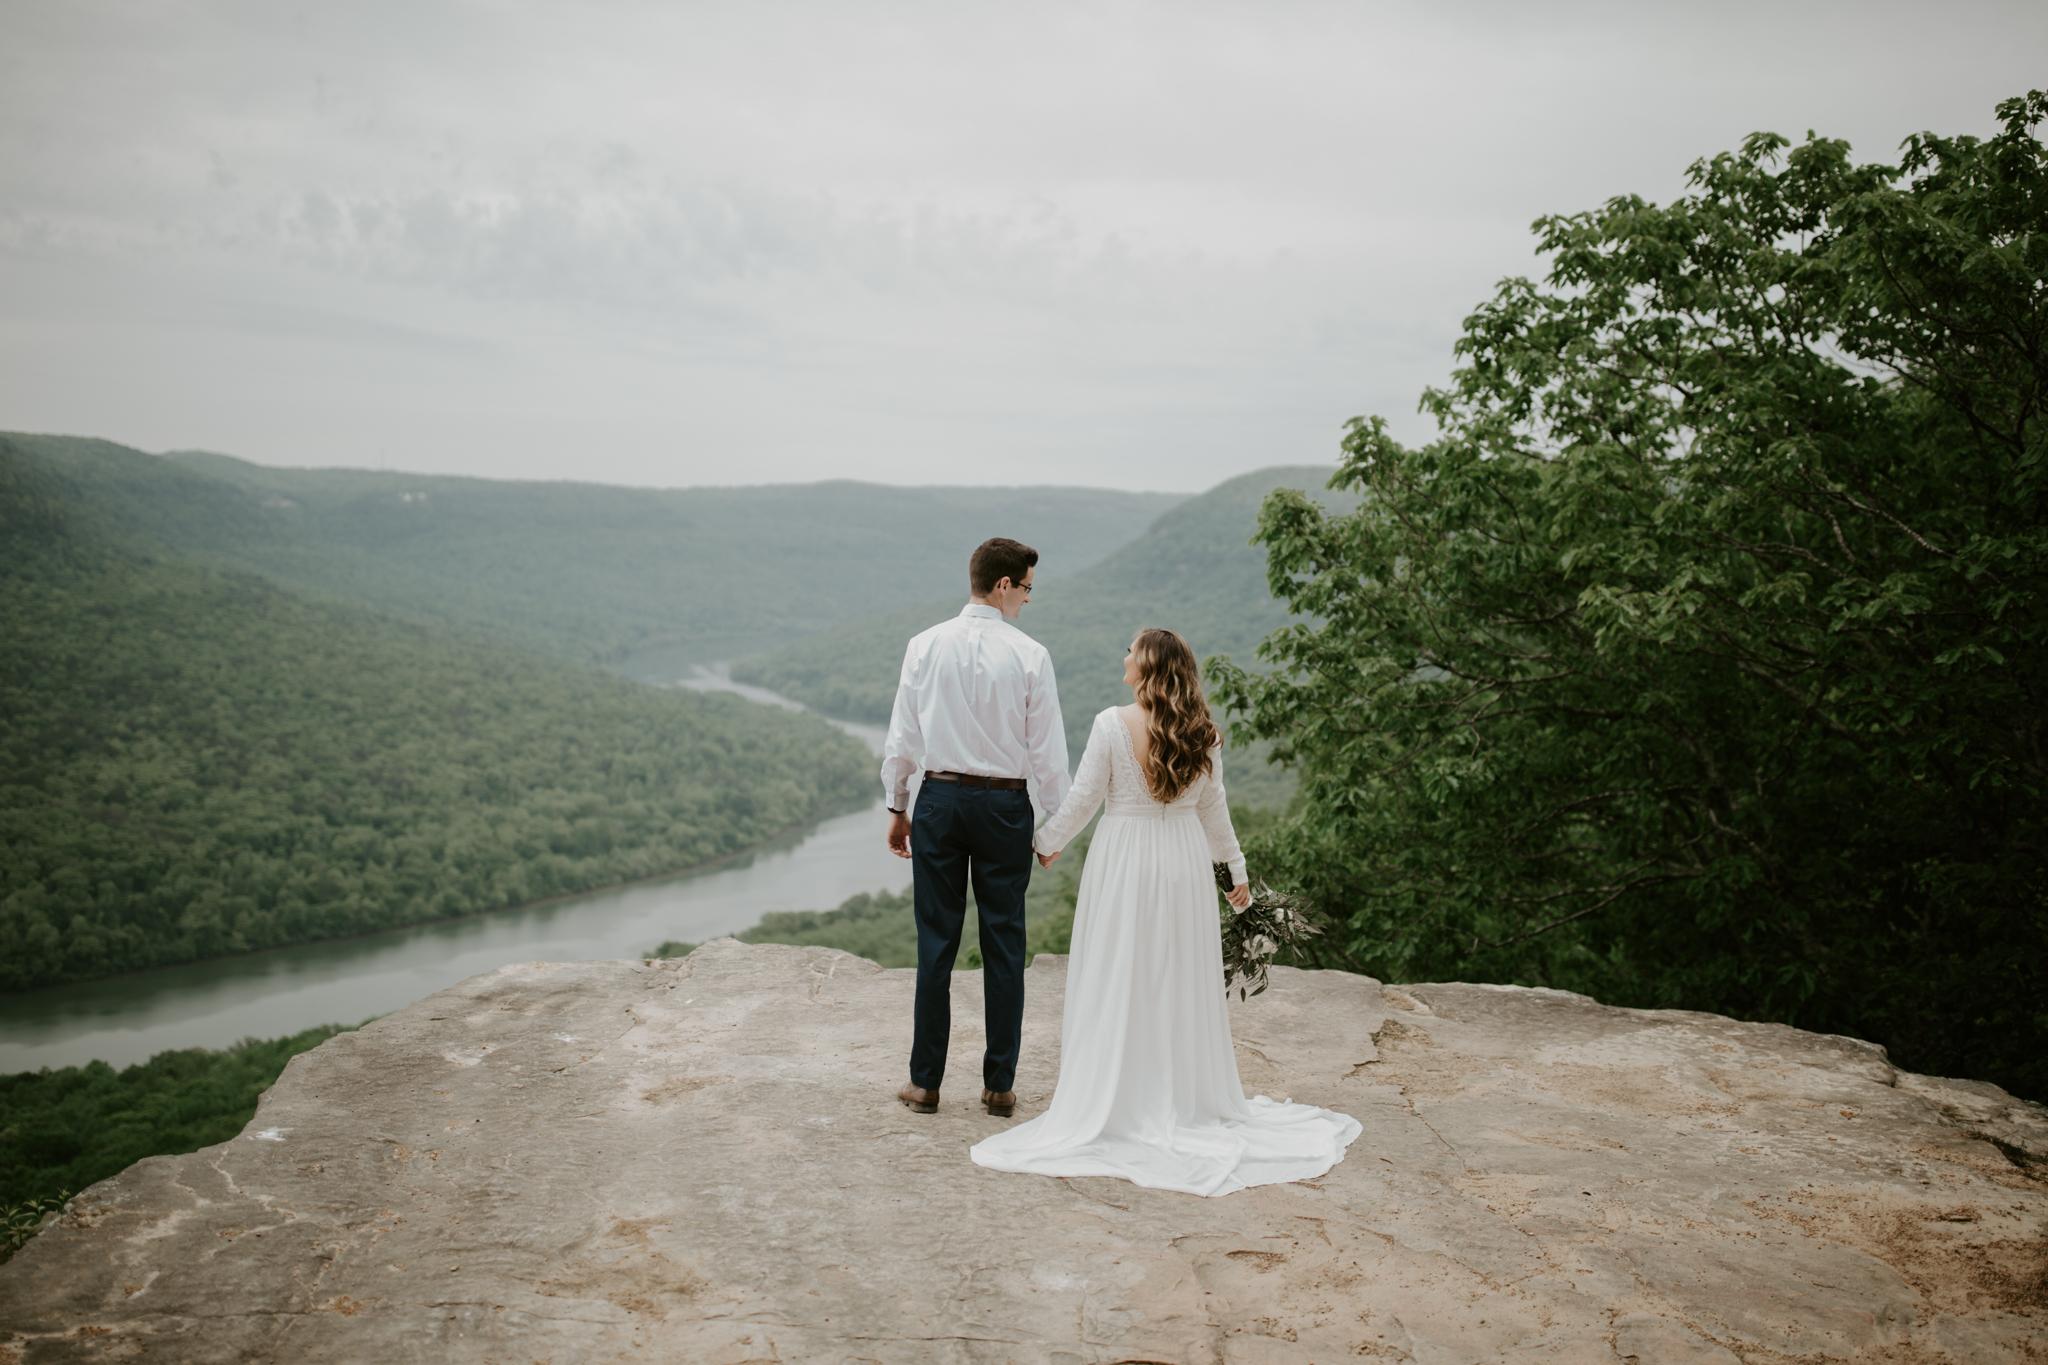 Lacey-Joe-Chattanooga-Nashville-Tennessee-Wedding-Elopement-Photographer-10.jpg